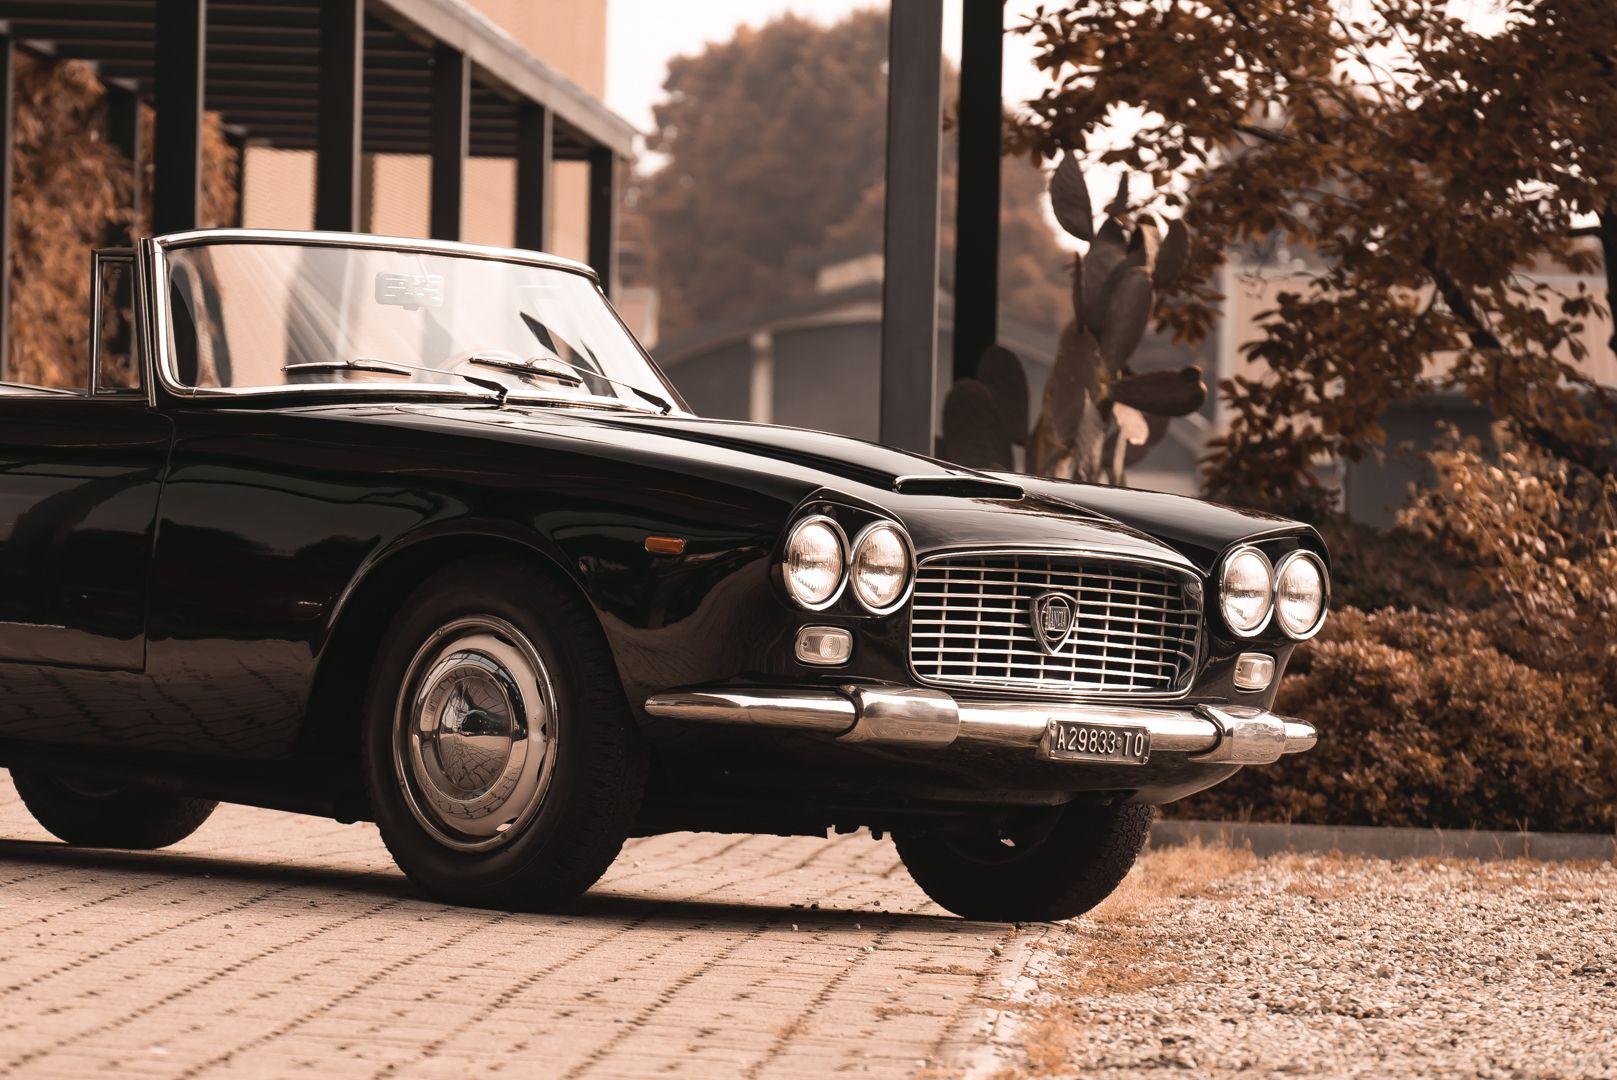 1968 Lancia Flaminia Touring Convertible 2800 3C 79130